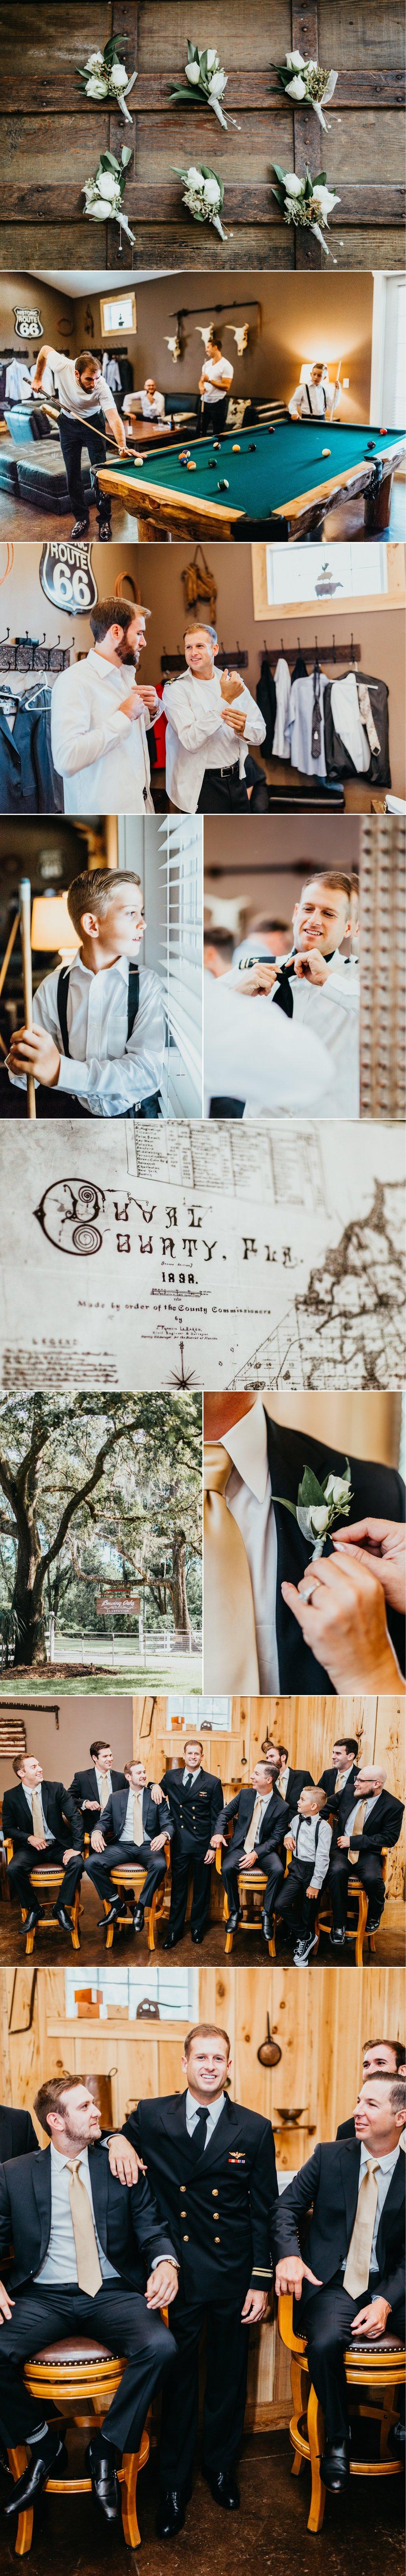 Farmhouse Chic Bowing Oaks Plantation Wedding- Orlando Photographer  4.jpg